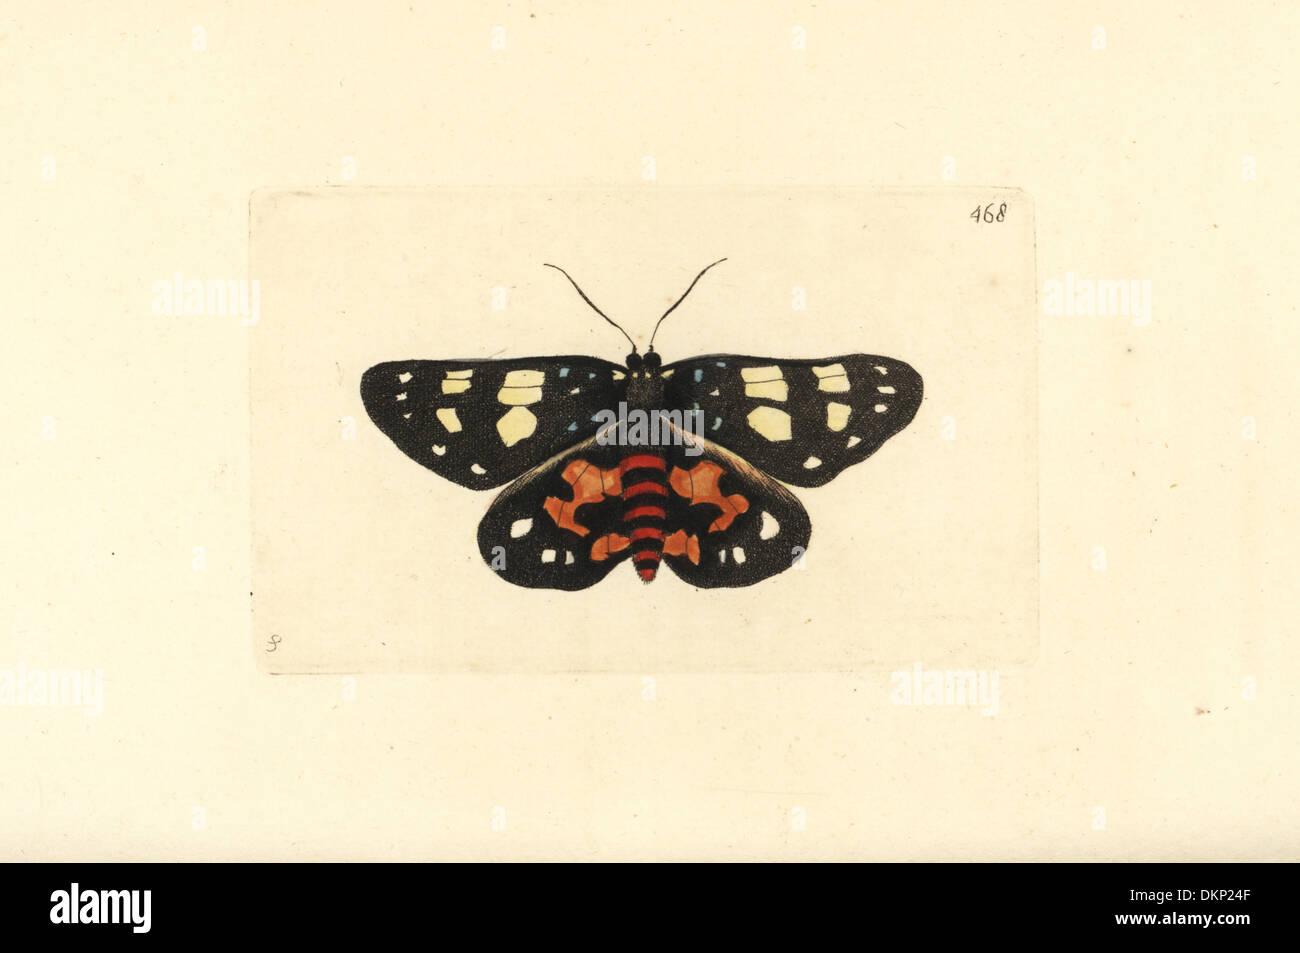 Episteme moth Episteme lectrix szechuanensis (Lectrix moth Phalaena lectrix). Rare moth native to China. Illustration drawn by - Stock Image